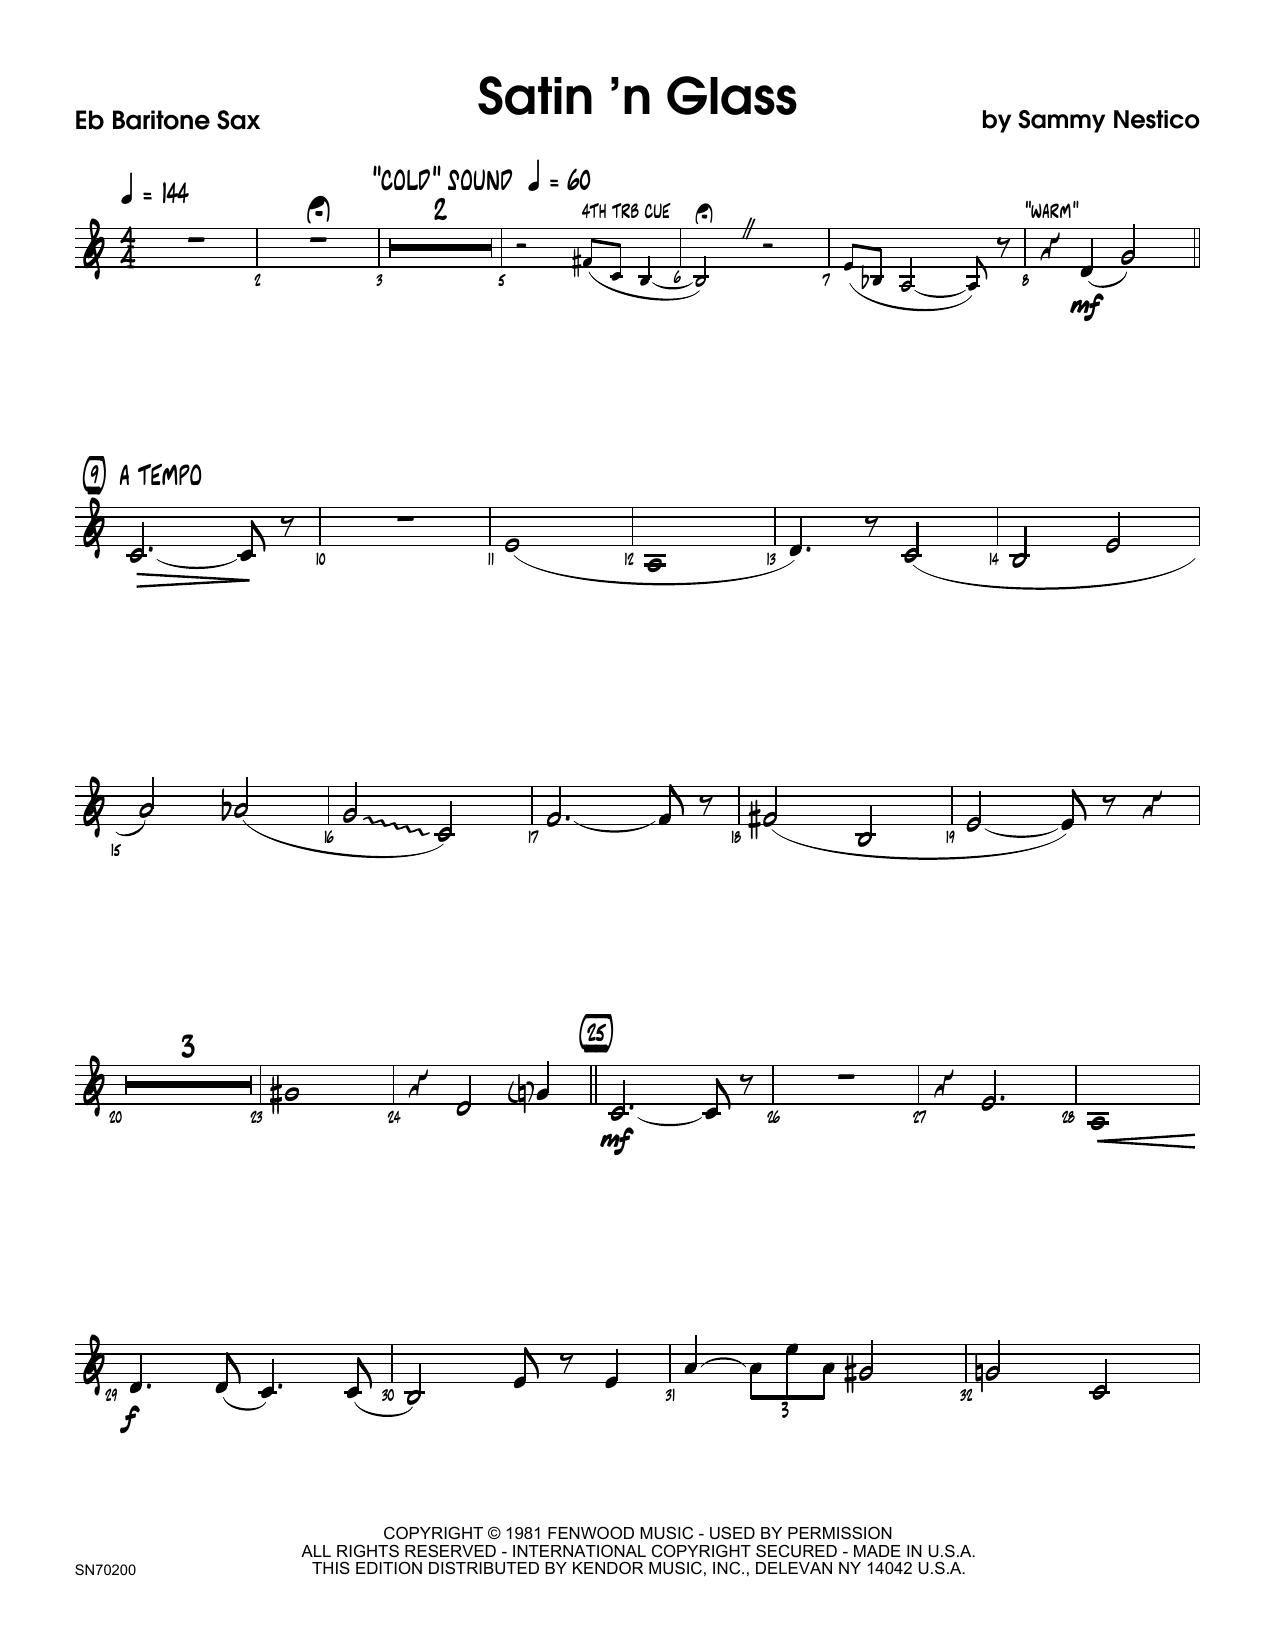 Satin 'n Glass - Eb Baritone Saxophone